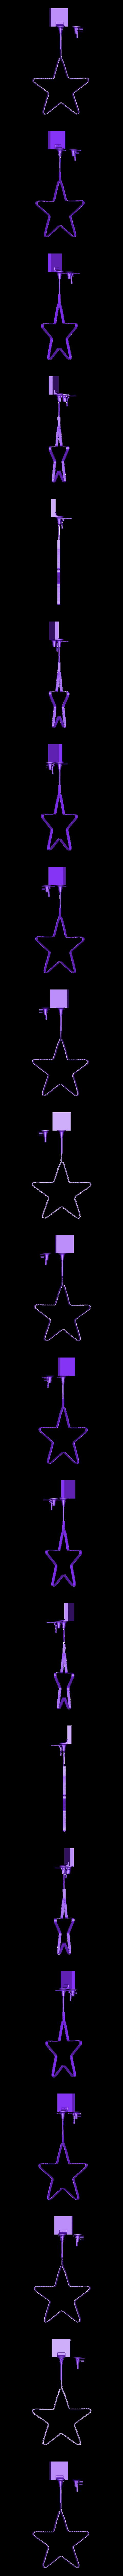 Vega_-_The_LED-lit_Christmas_Star__Electric_assembly_.stl Download free STL file Vega - The LED-lit Christmas Star • 3D print model, CreativeTools